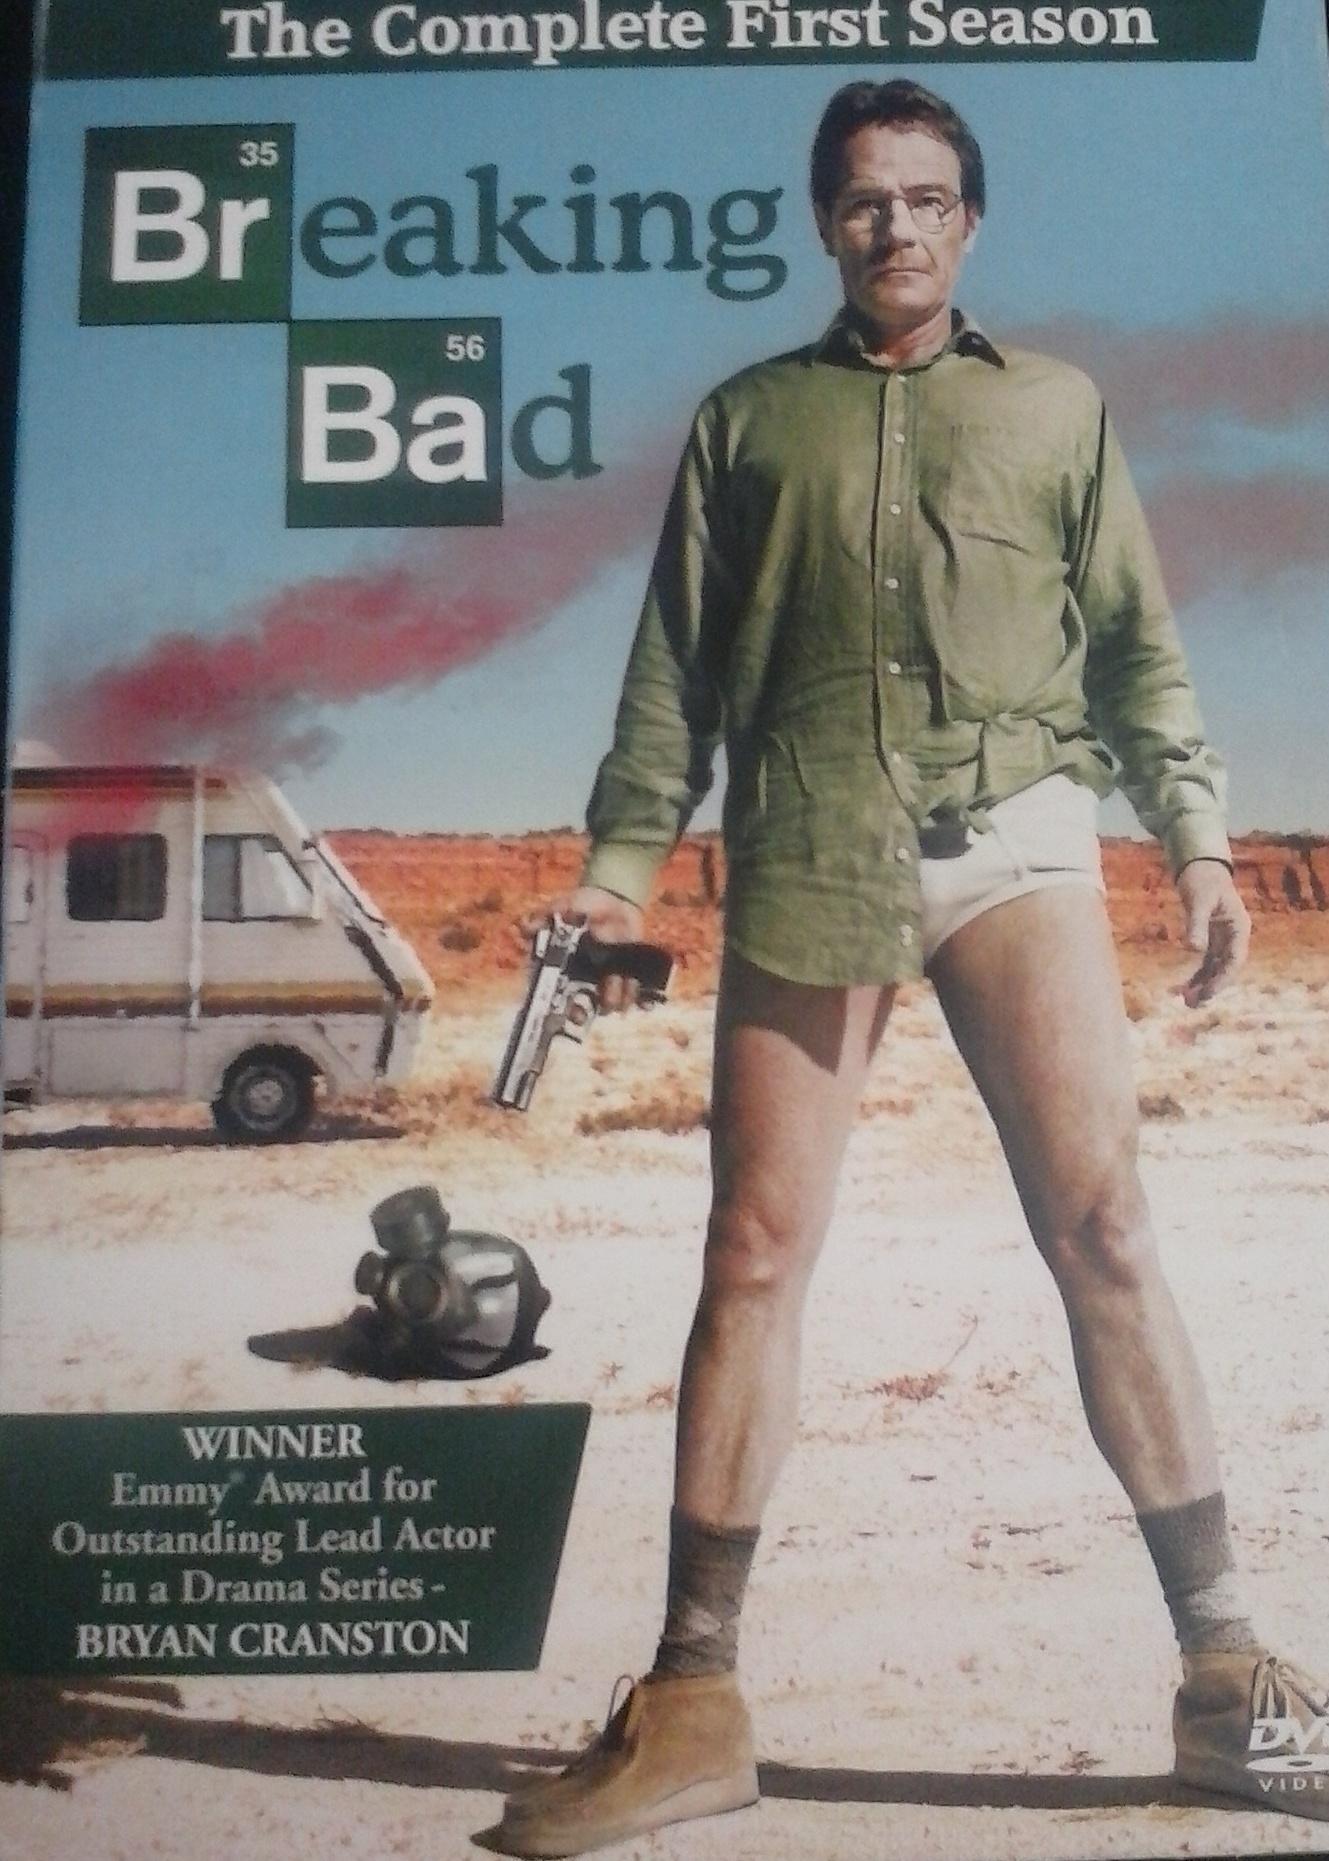 BREAKING BAD SEASON 1 FULL DVD BOX SET